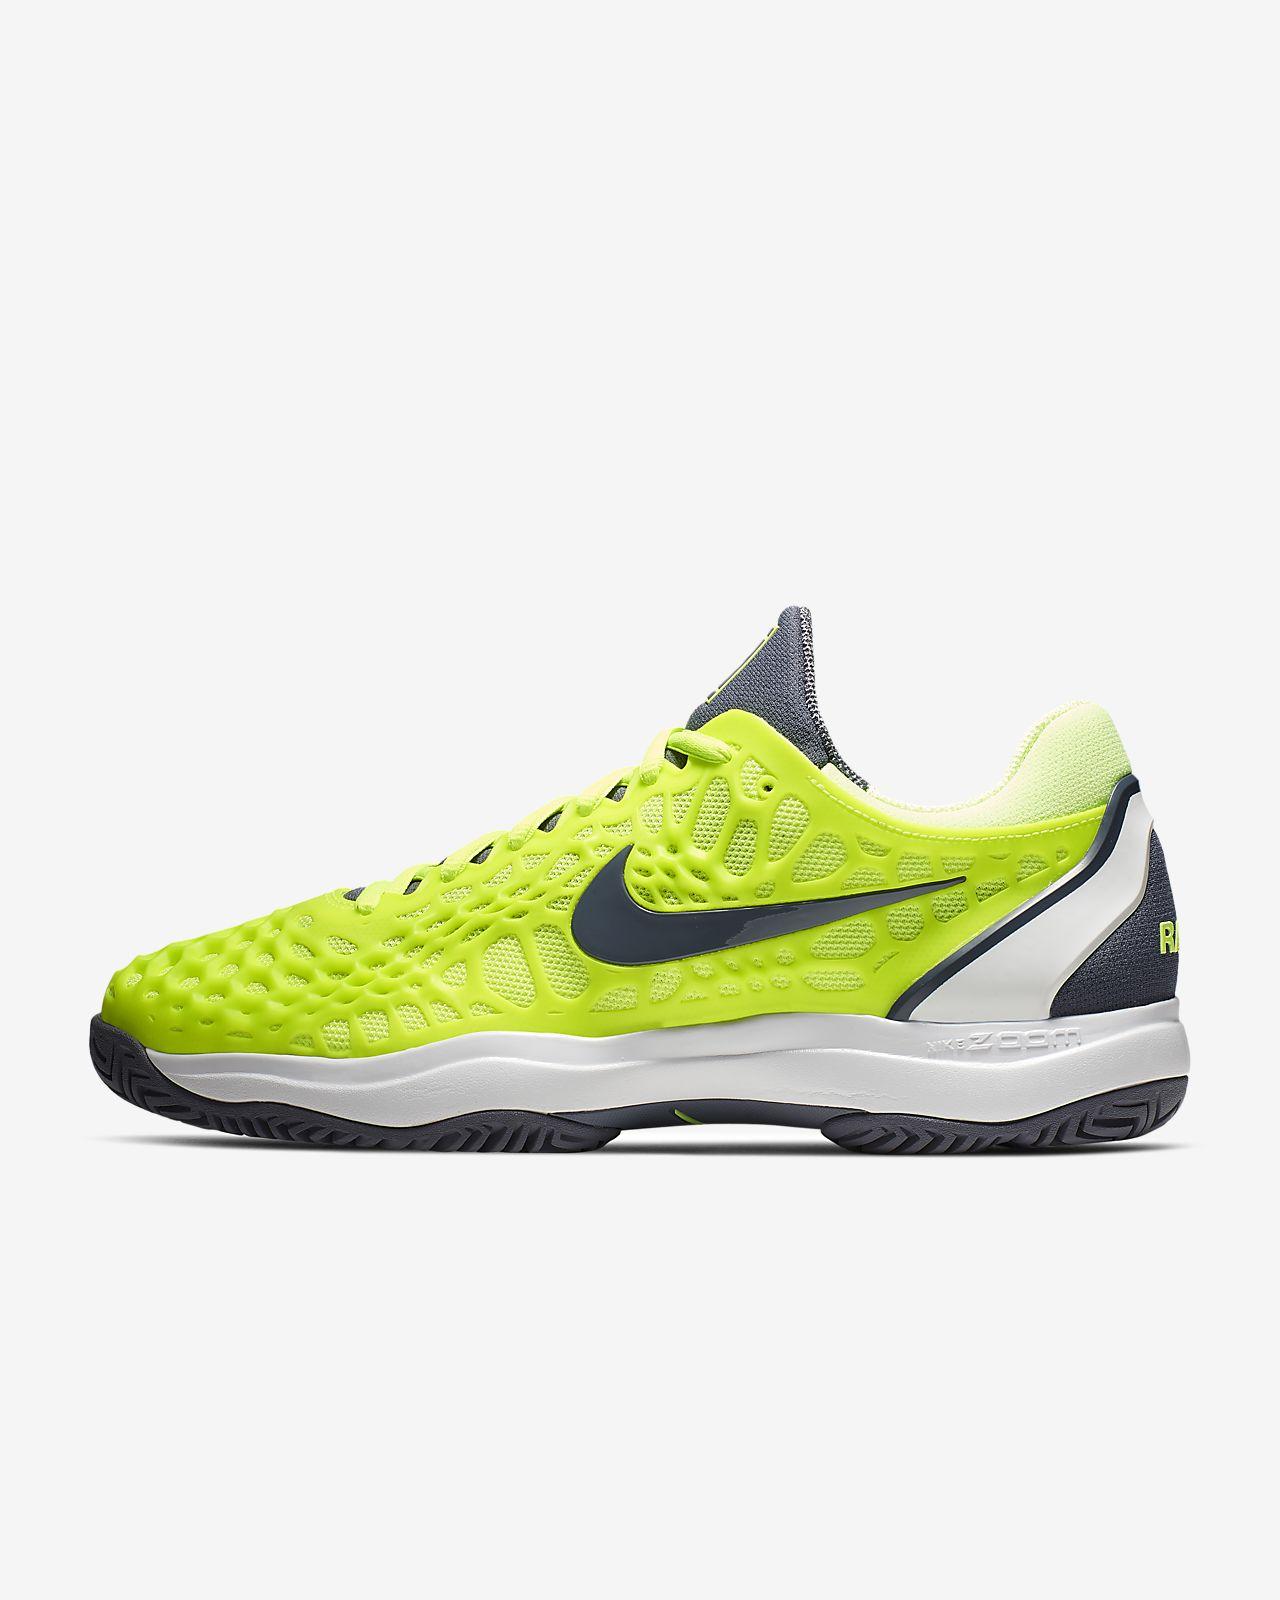 Calzado de tenis de cancha dura para hombre NikeCourt Zoom Cage 3